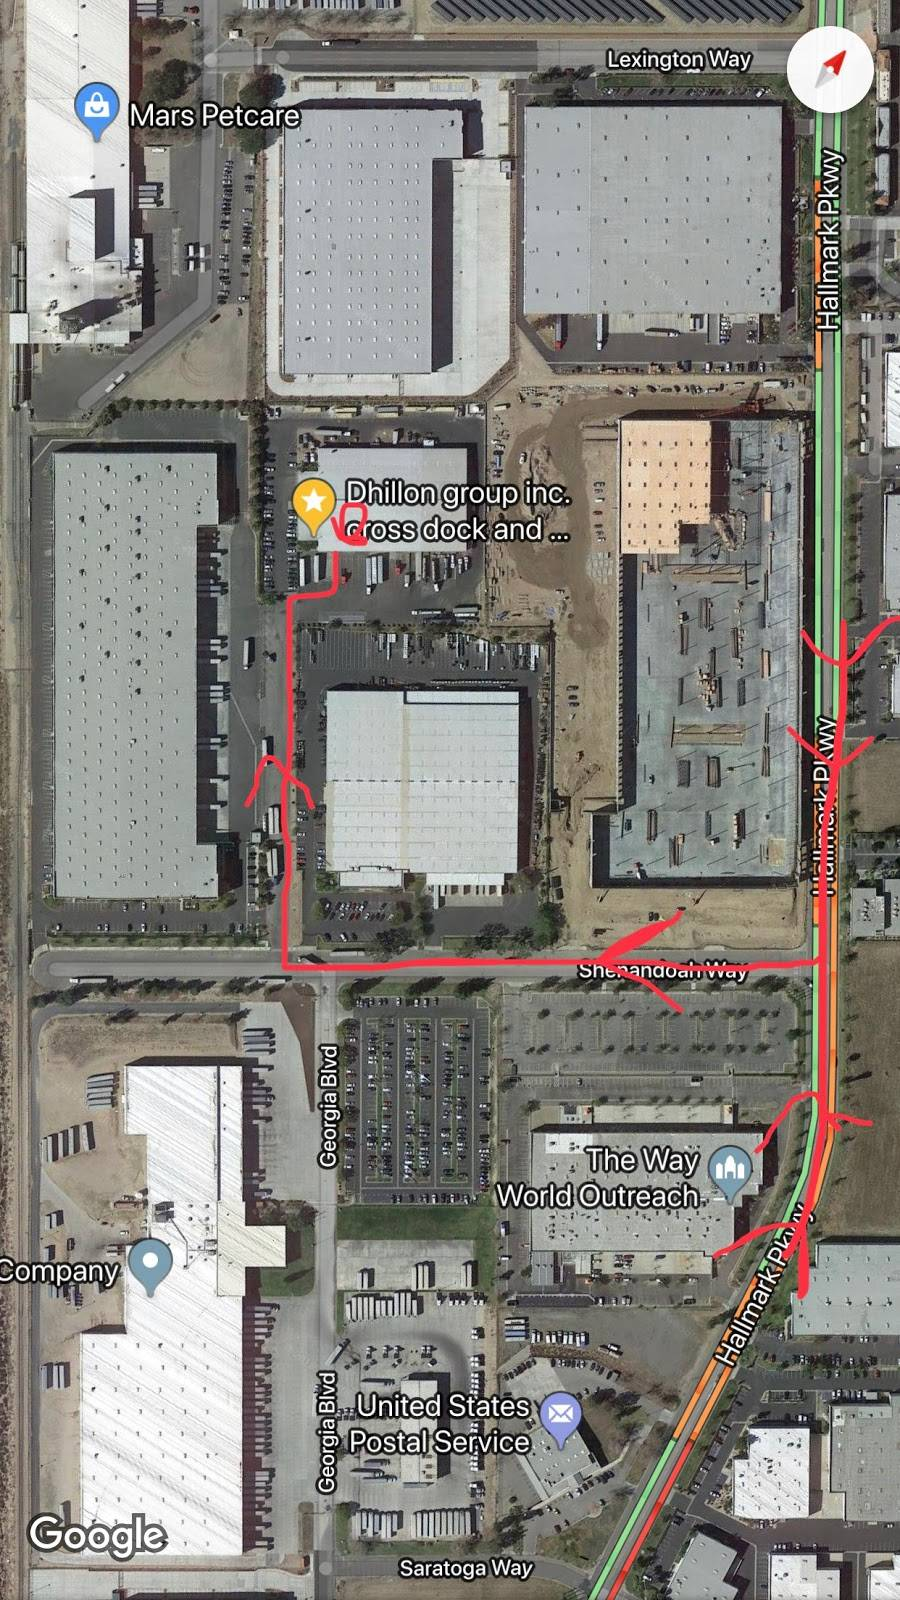 Dhillon group inc. cross dock and warehouse - moving company  | Photo 2 of 2 | Address: 2586 Shenandoah Way, San Bernardino, CA 92407, USA | Phone: (909) 904-4158